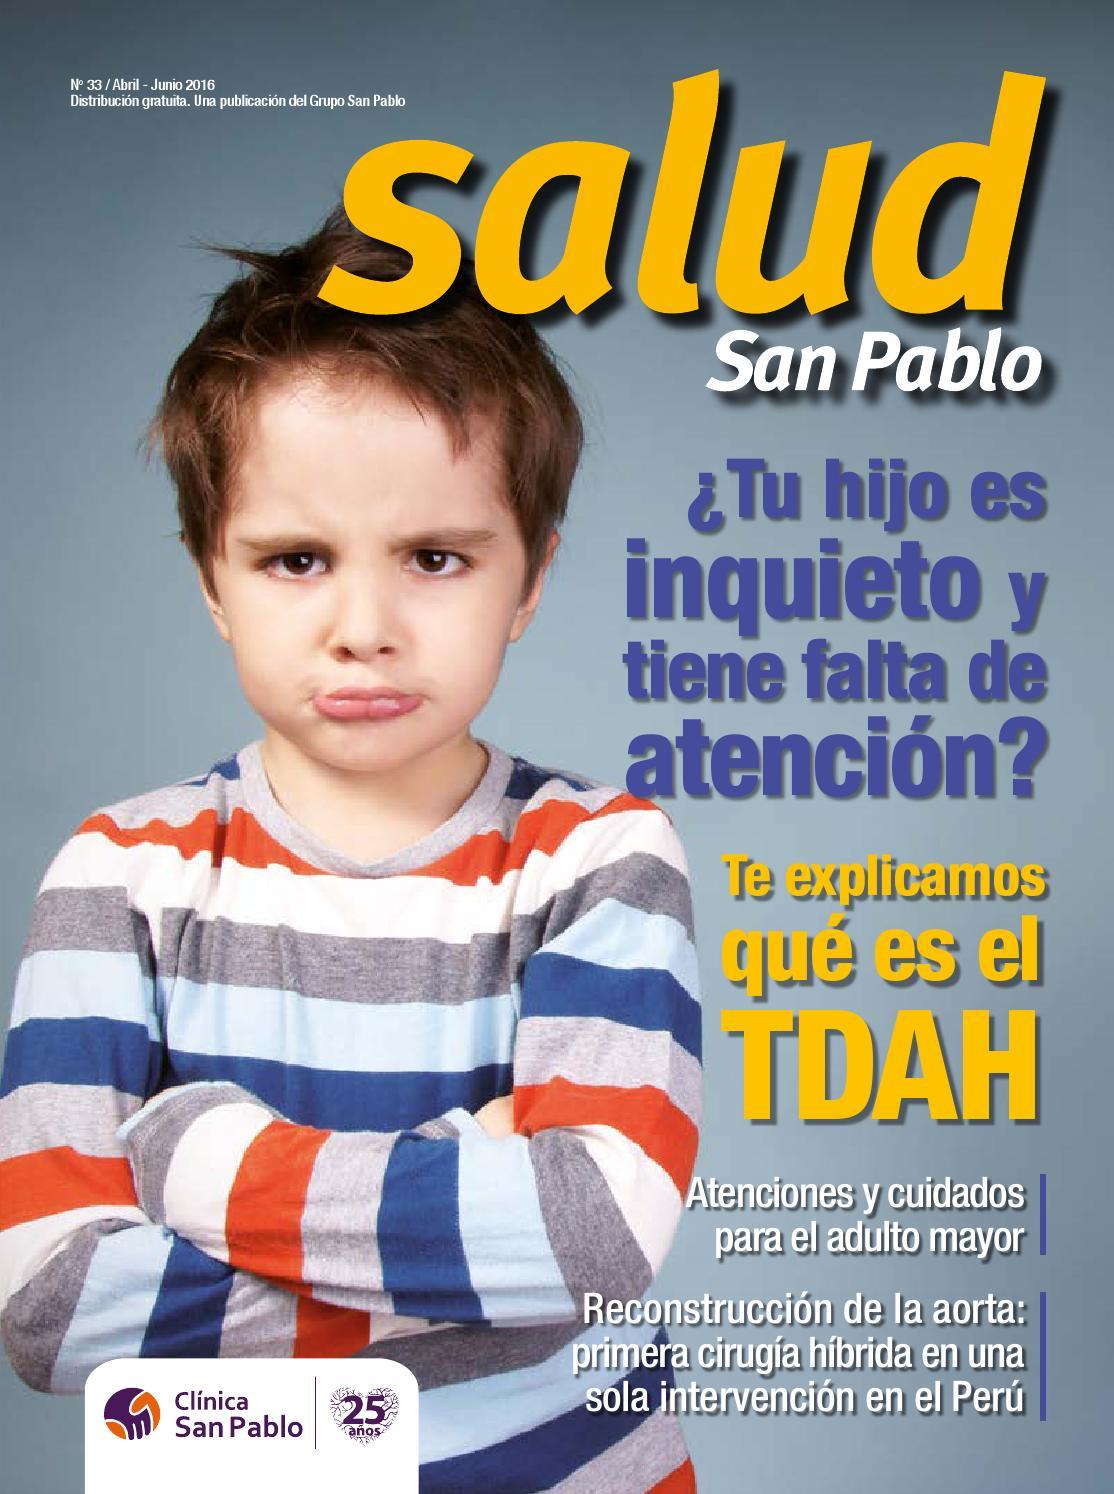 Revista San Pablo Salud N°33 by San Pablo - issuu